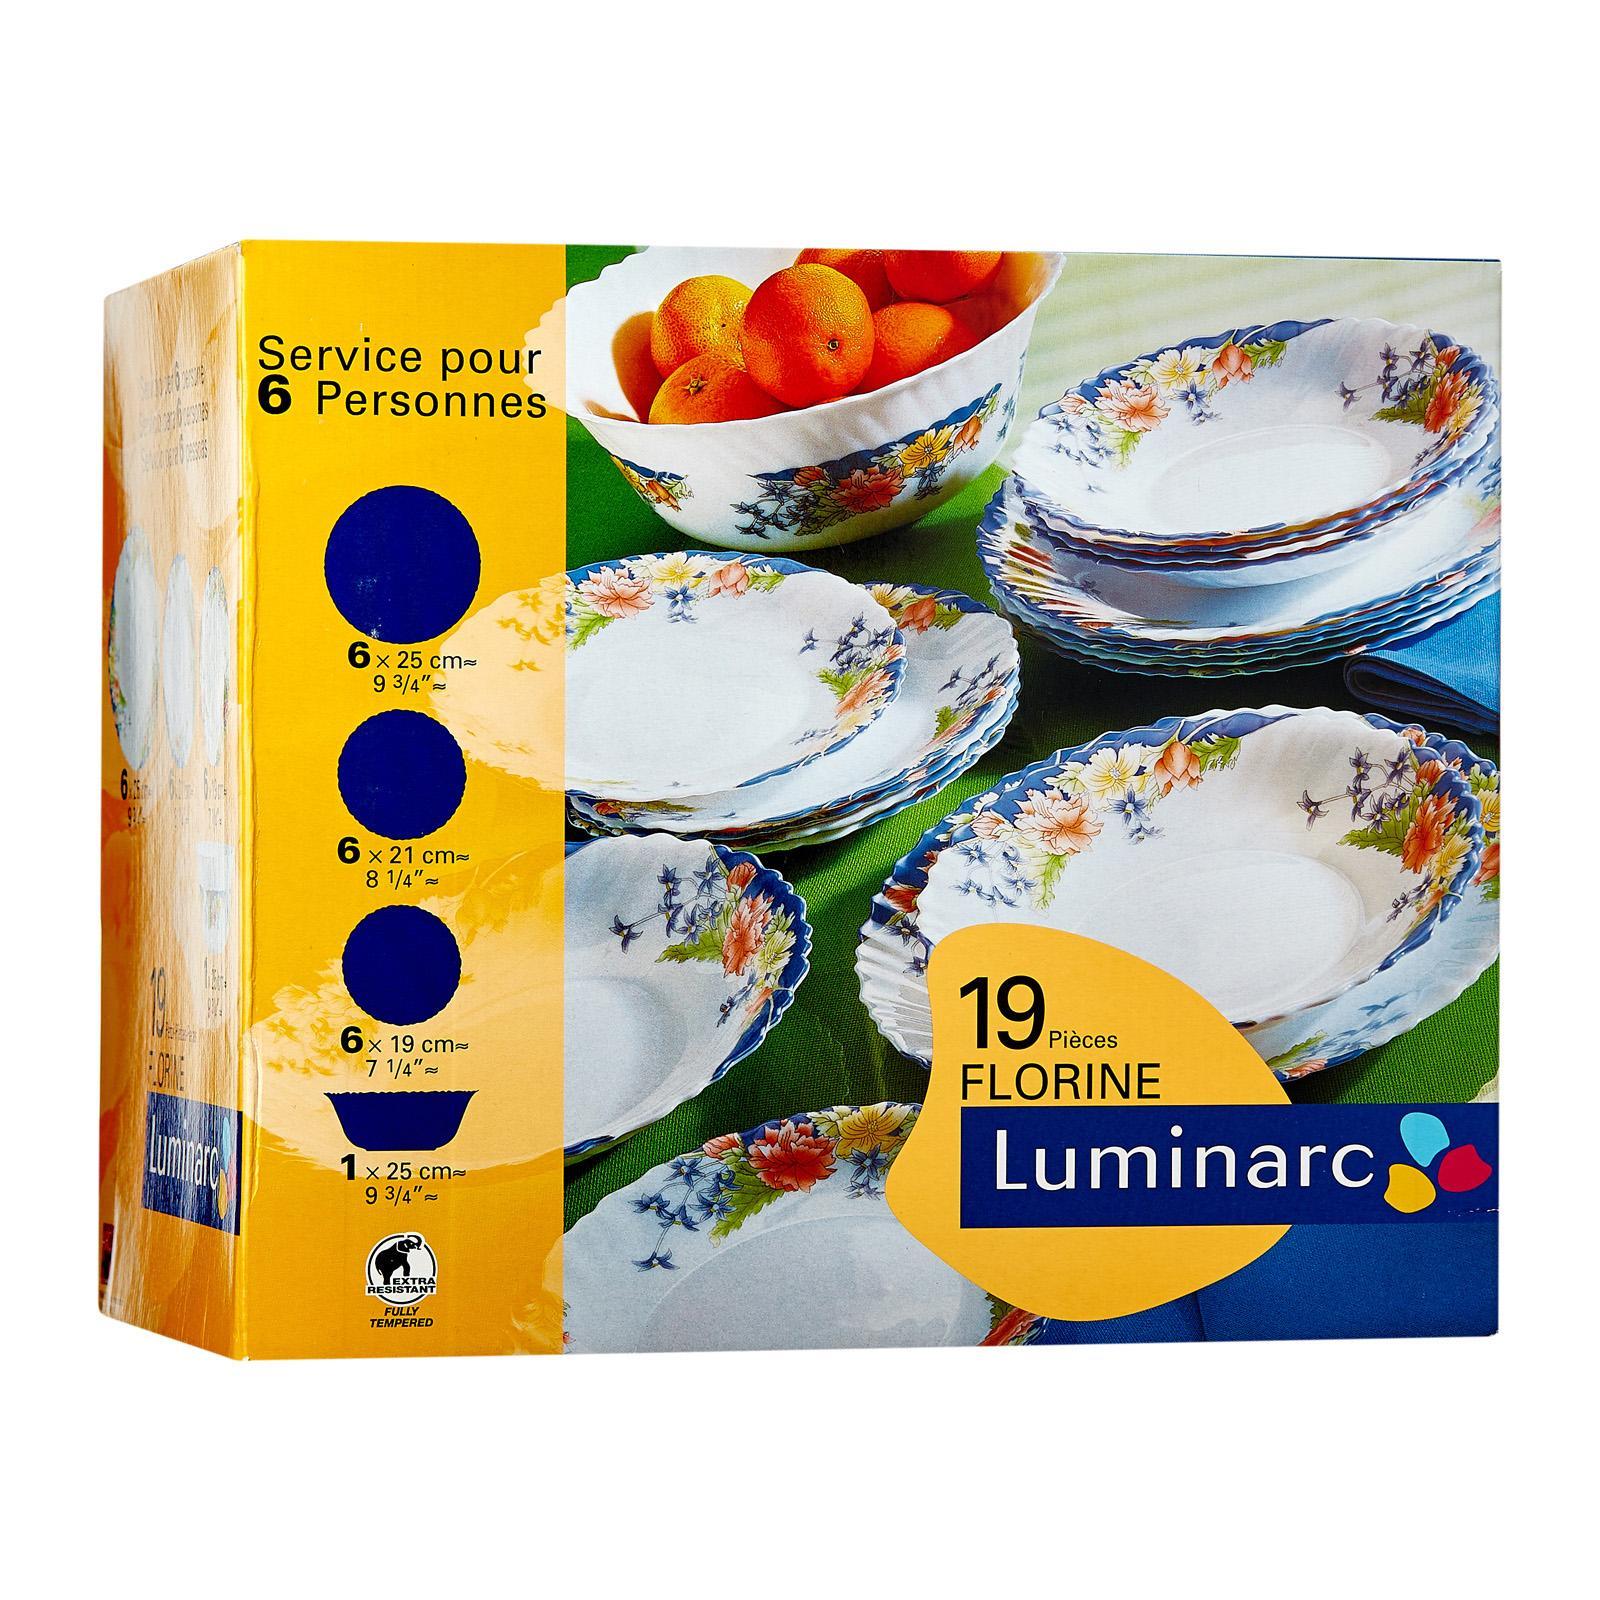 Luminarc Florine 19 Pcs Dinner Set